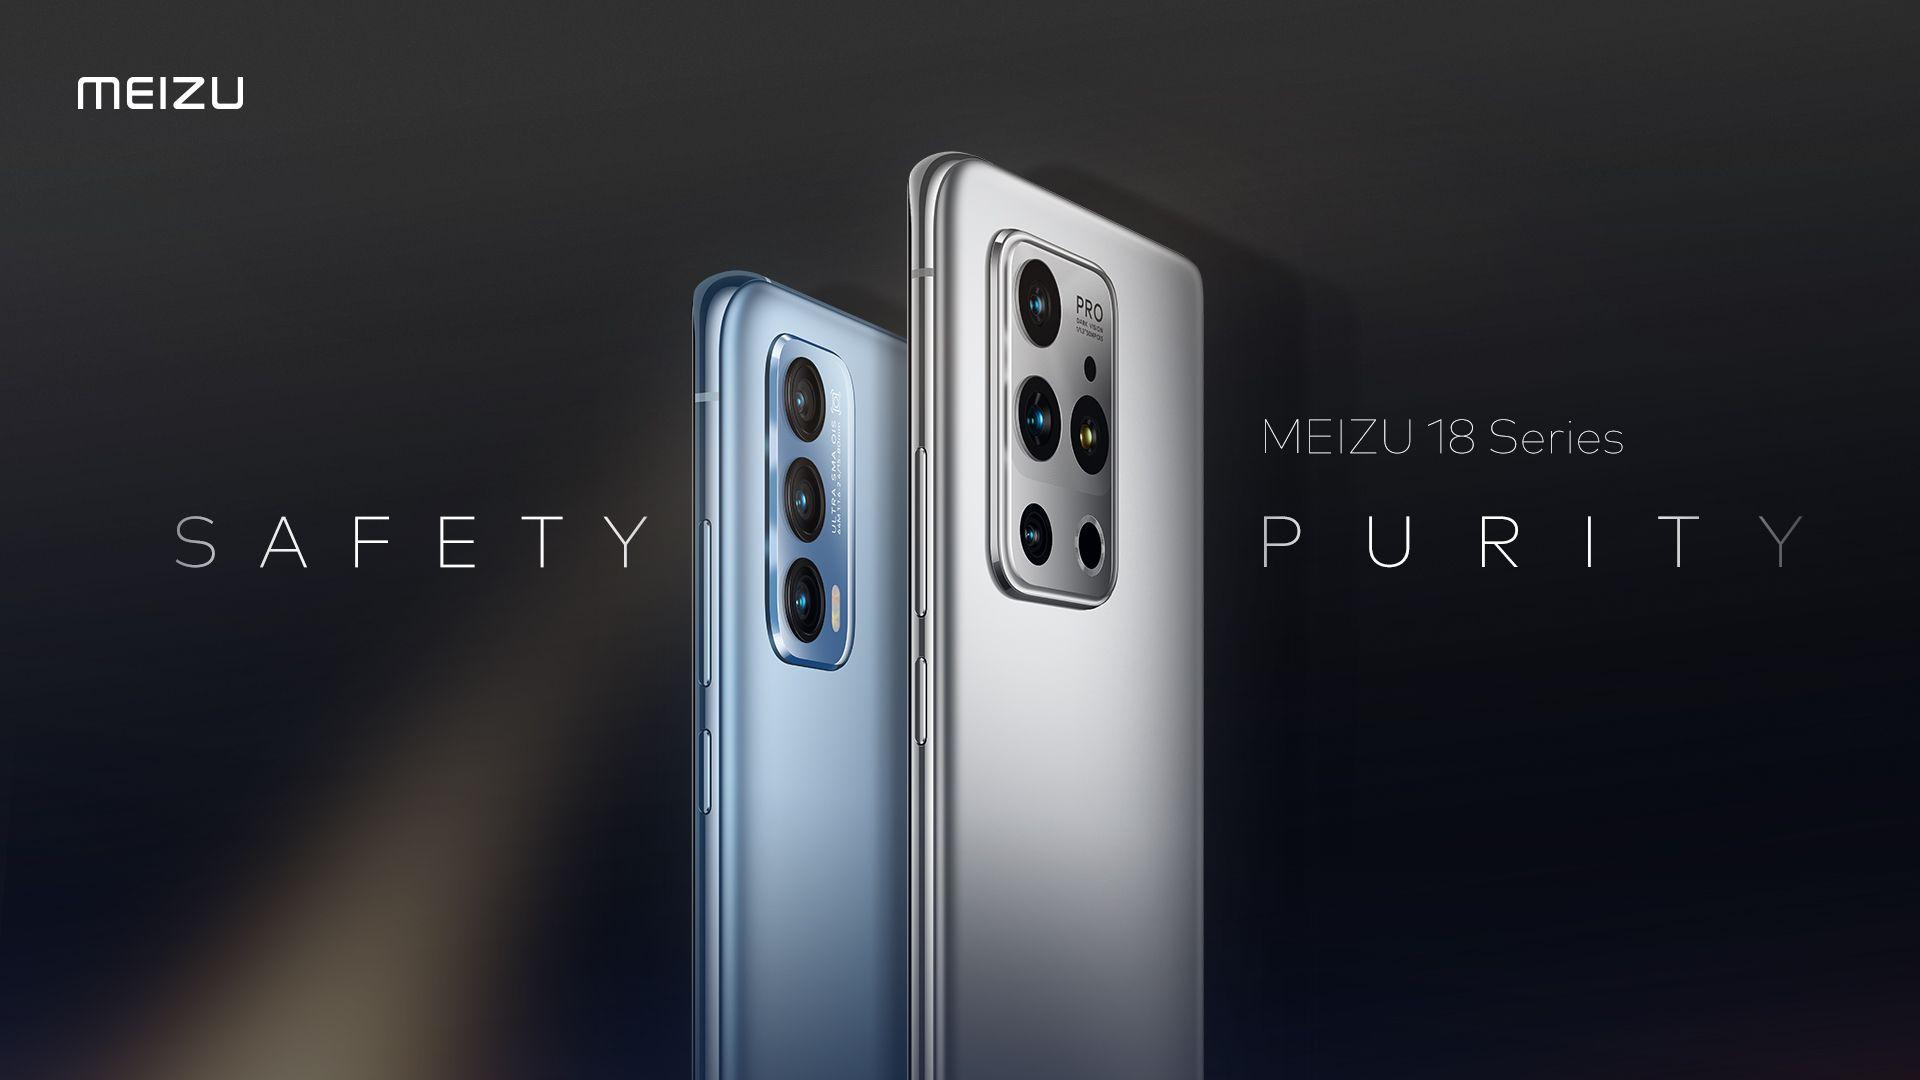 MEIZUの未発表3製品がMIITを通過、Meizu 18シリーズのマイナーチェンジモデルと魅力的な新製品